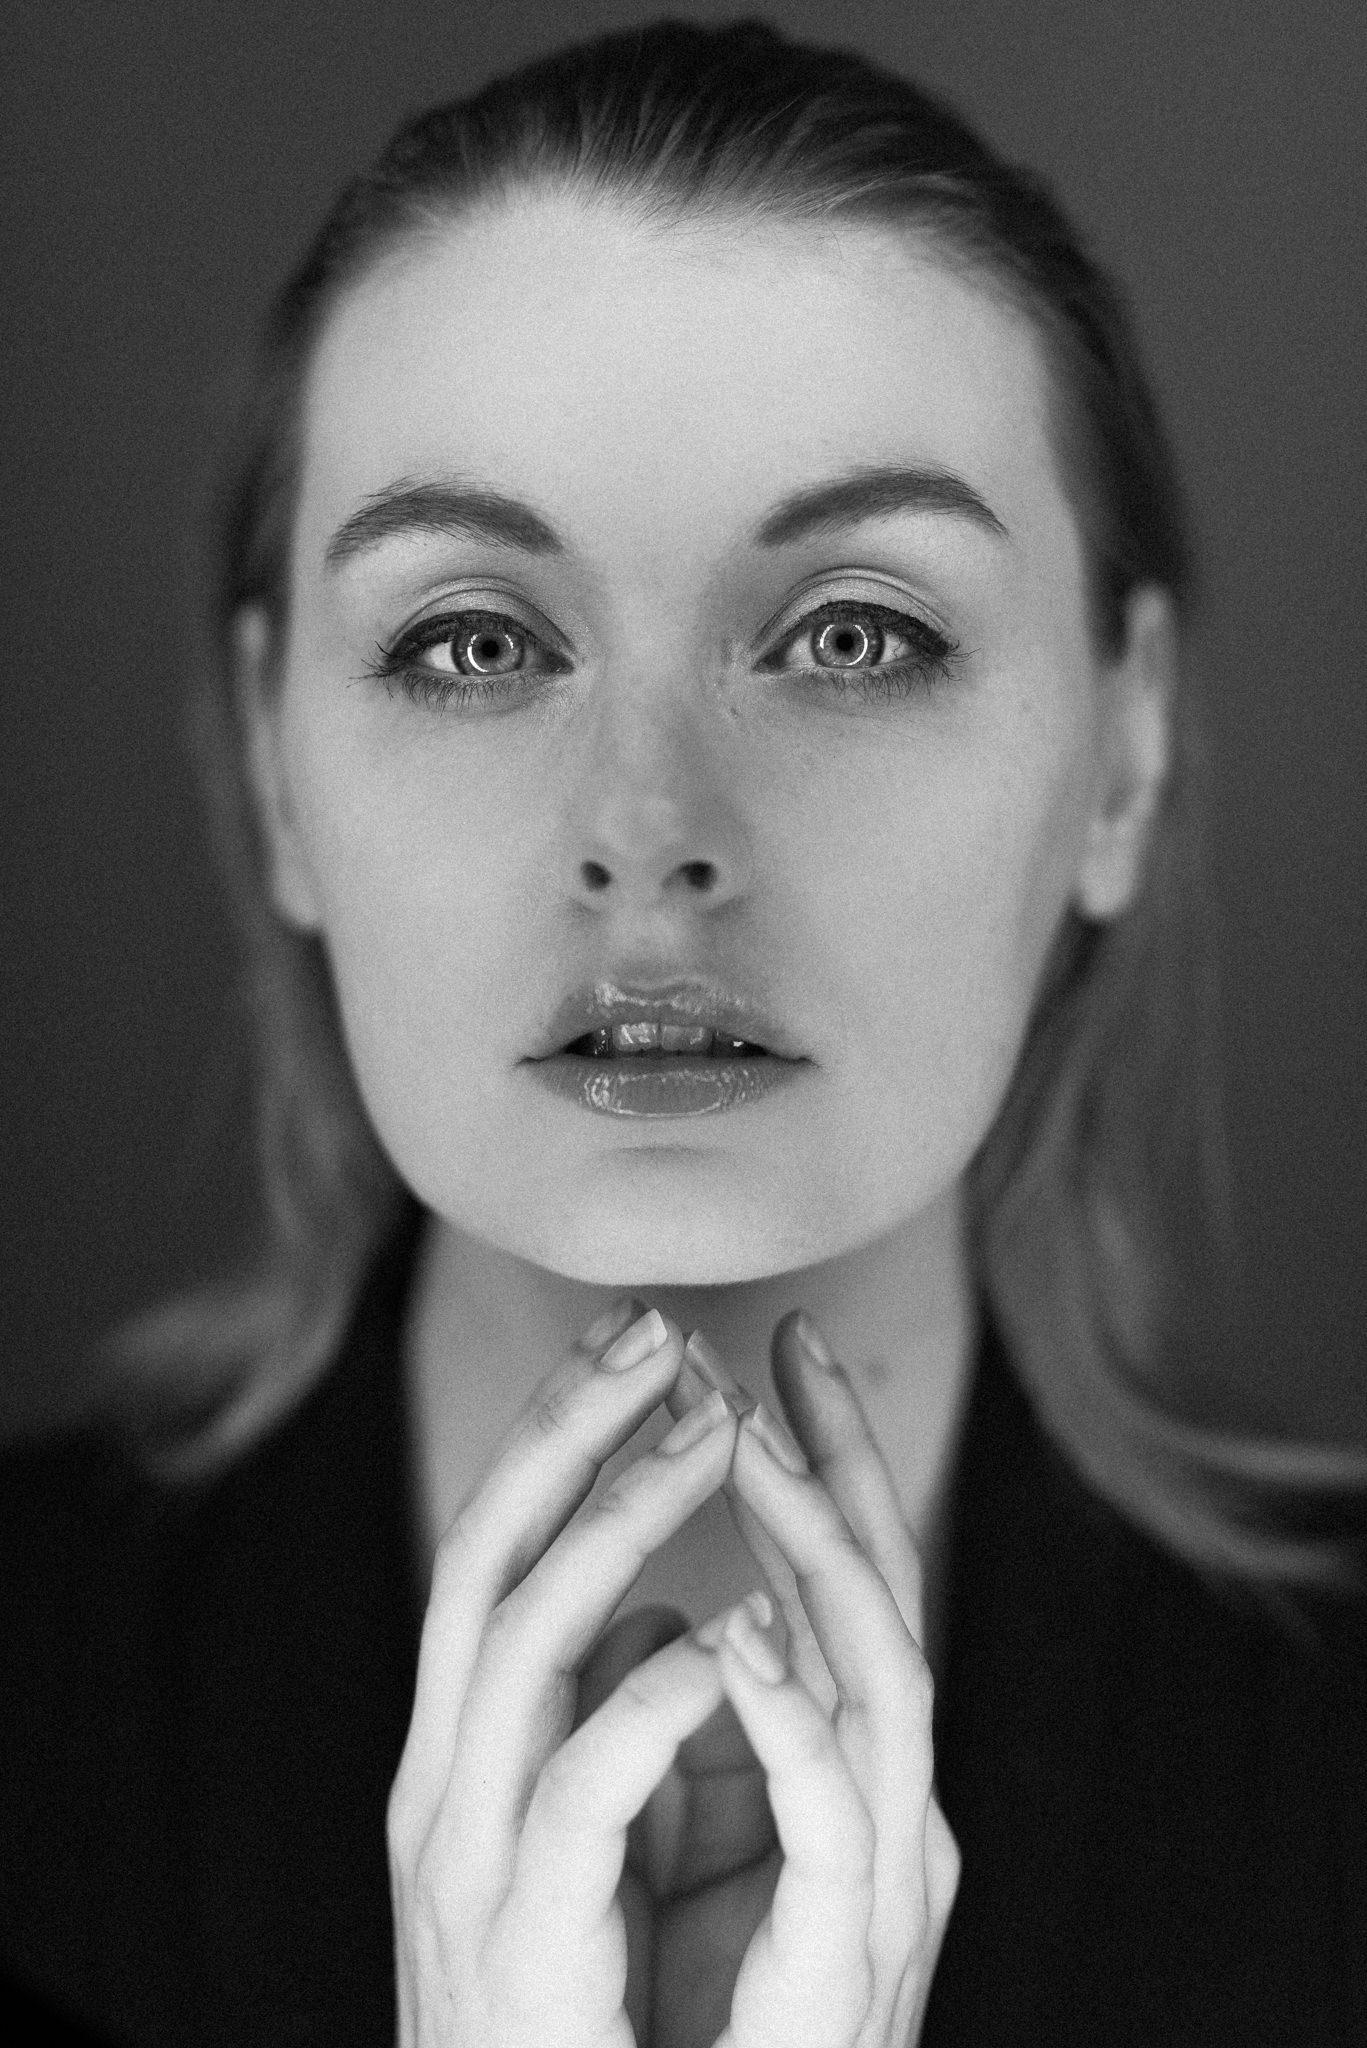 HollyAlexander-Studio-20170518-0251-Kris-Askey.jpg